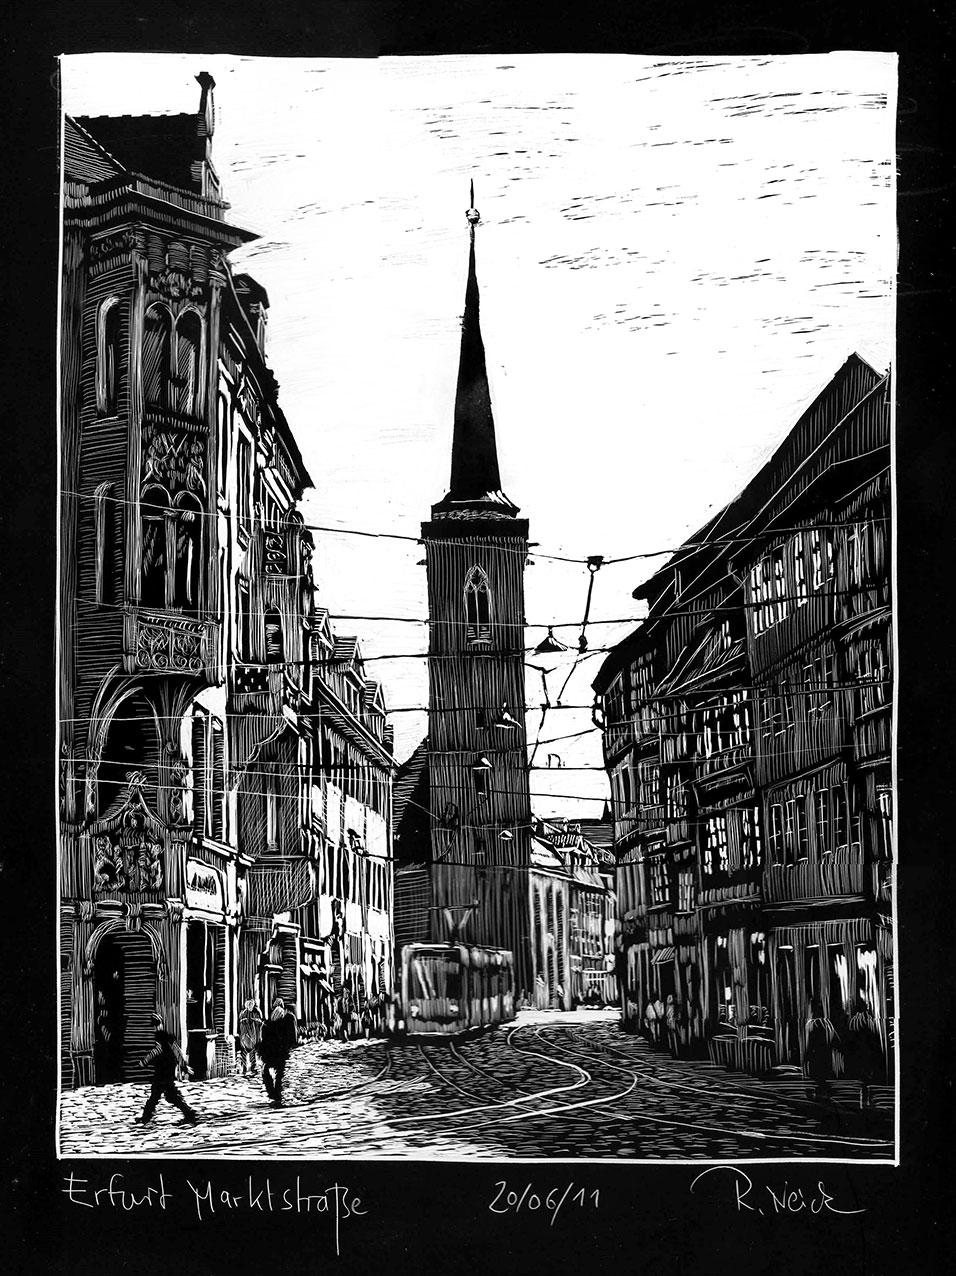 200611_Erfurt_marktstr